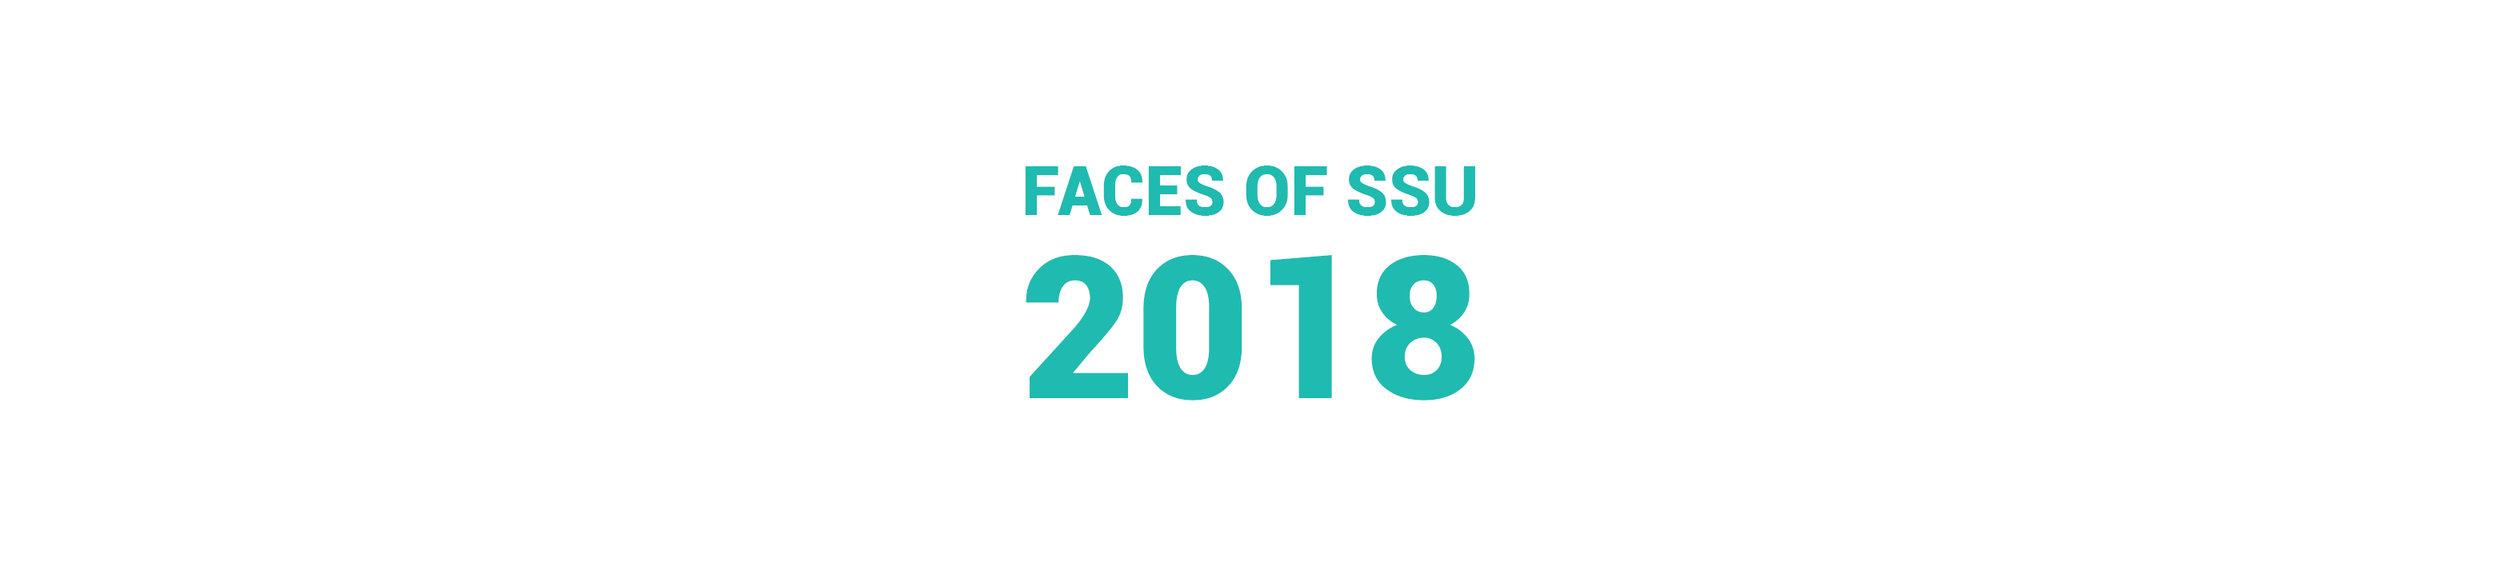 Faces of SSU Logo